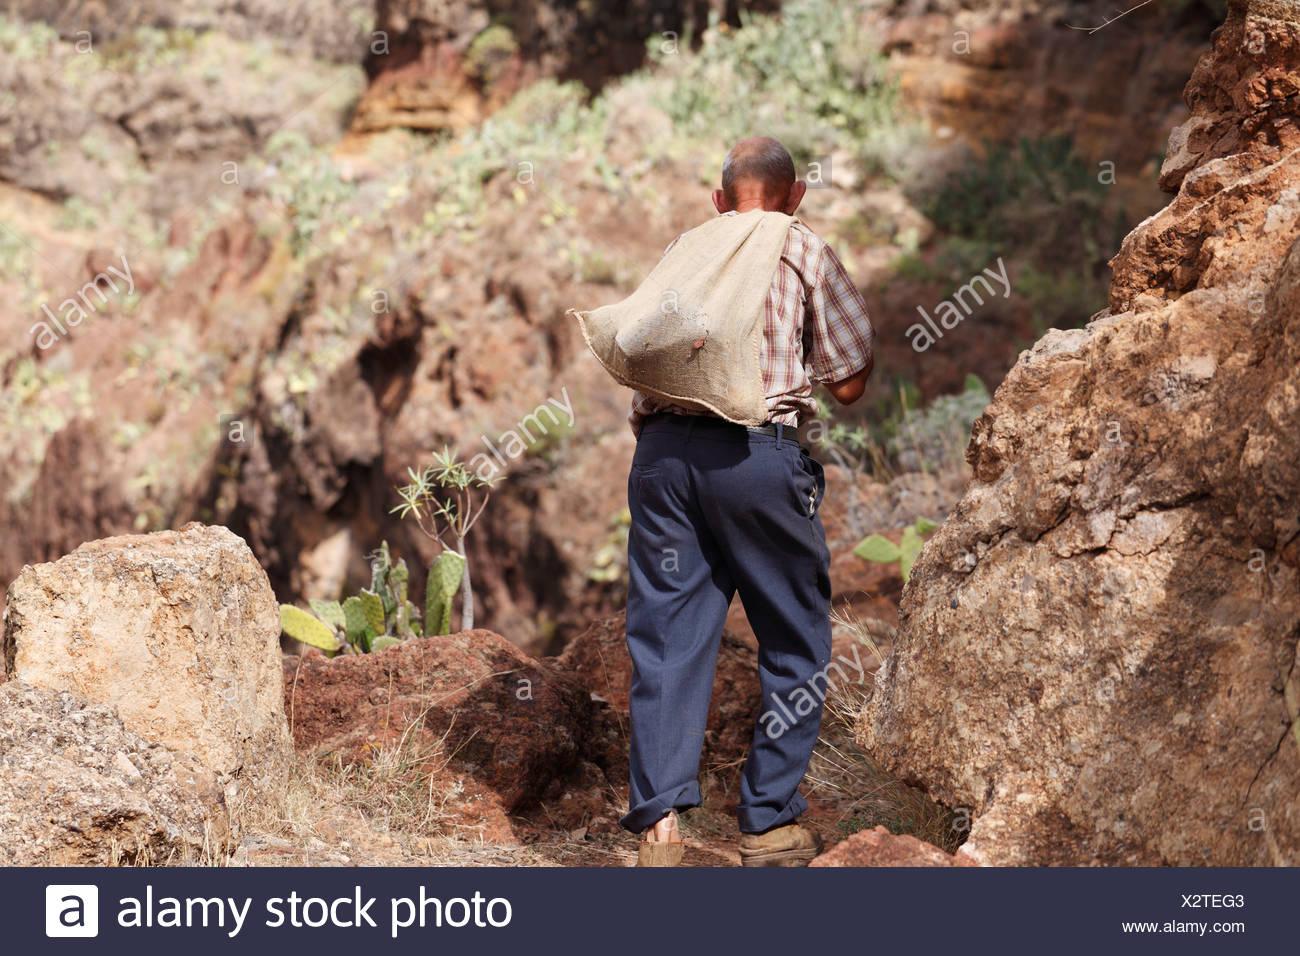 Local man carrying a sack on his back, Barranco de Guarimiar near Alajeró, La Gomera, Canary Islands, Spain, Europe - Stock Image